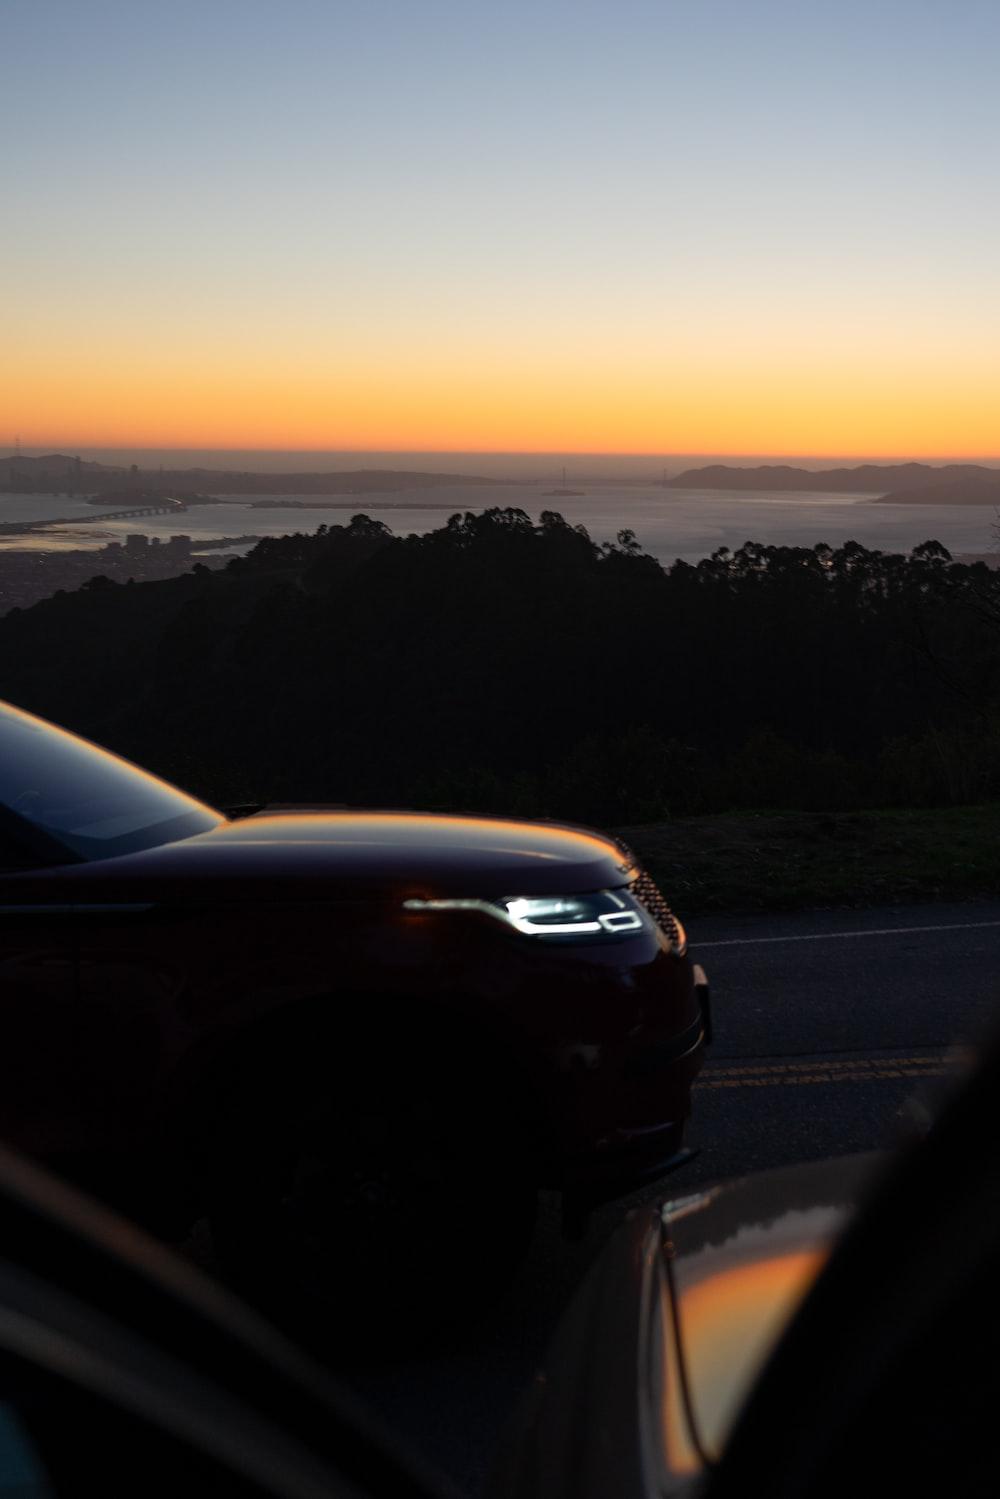 black car on road during sunset